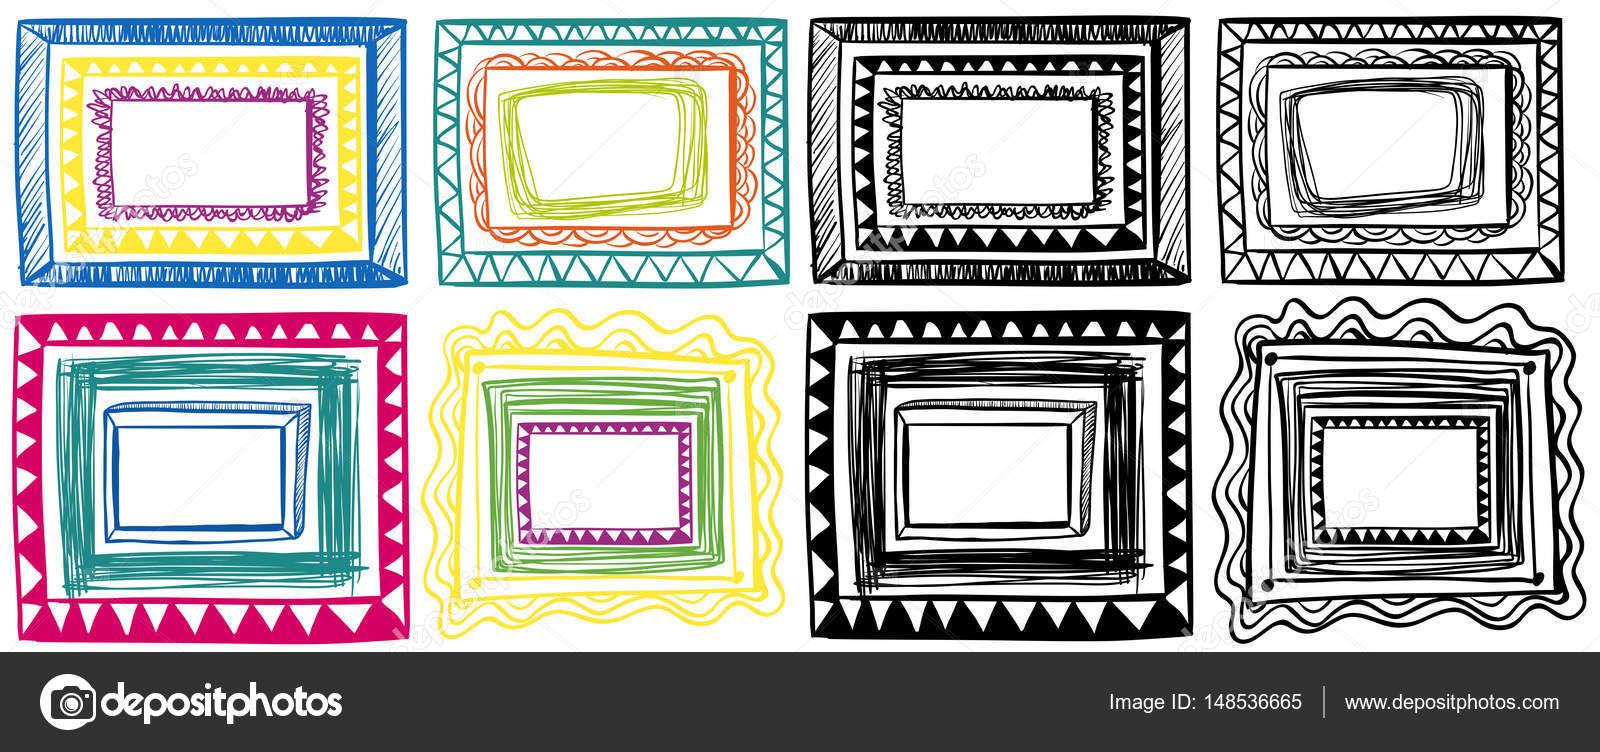 Different doodles of frame designs — Stock Vector © brgfx #148536665